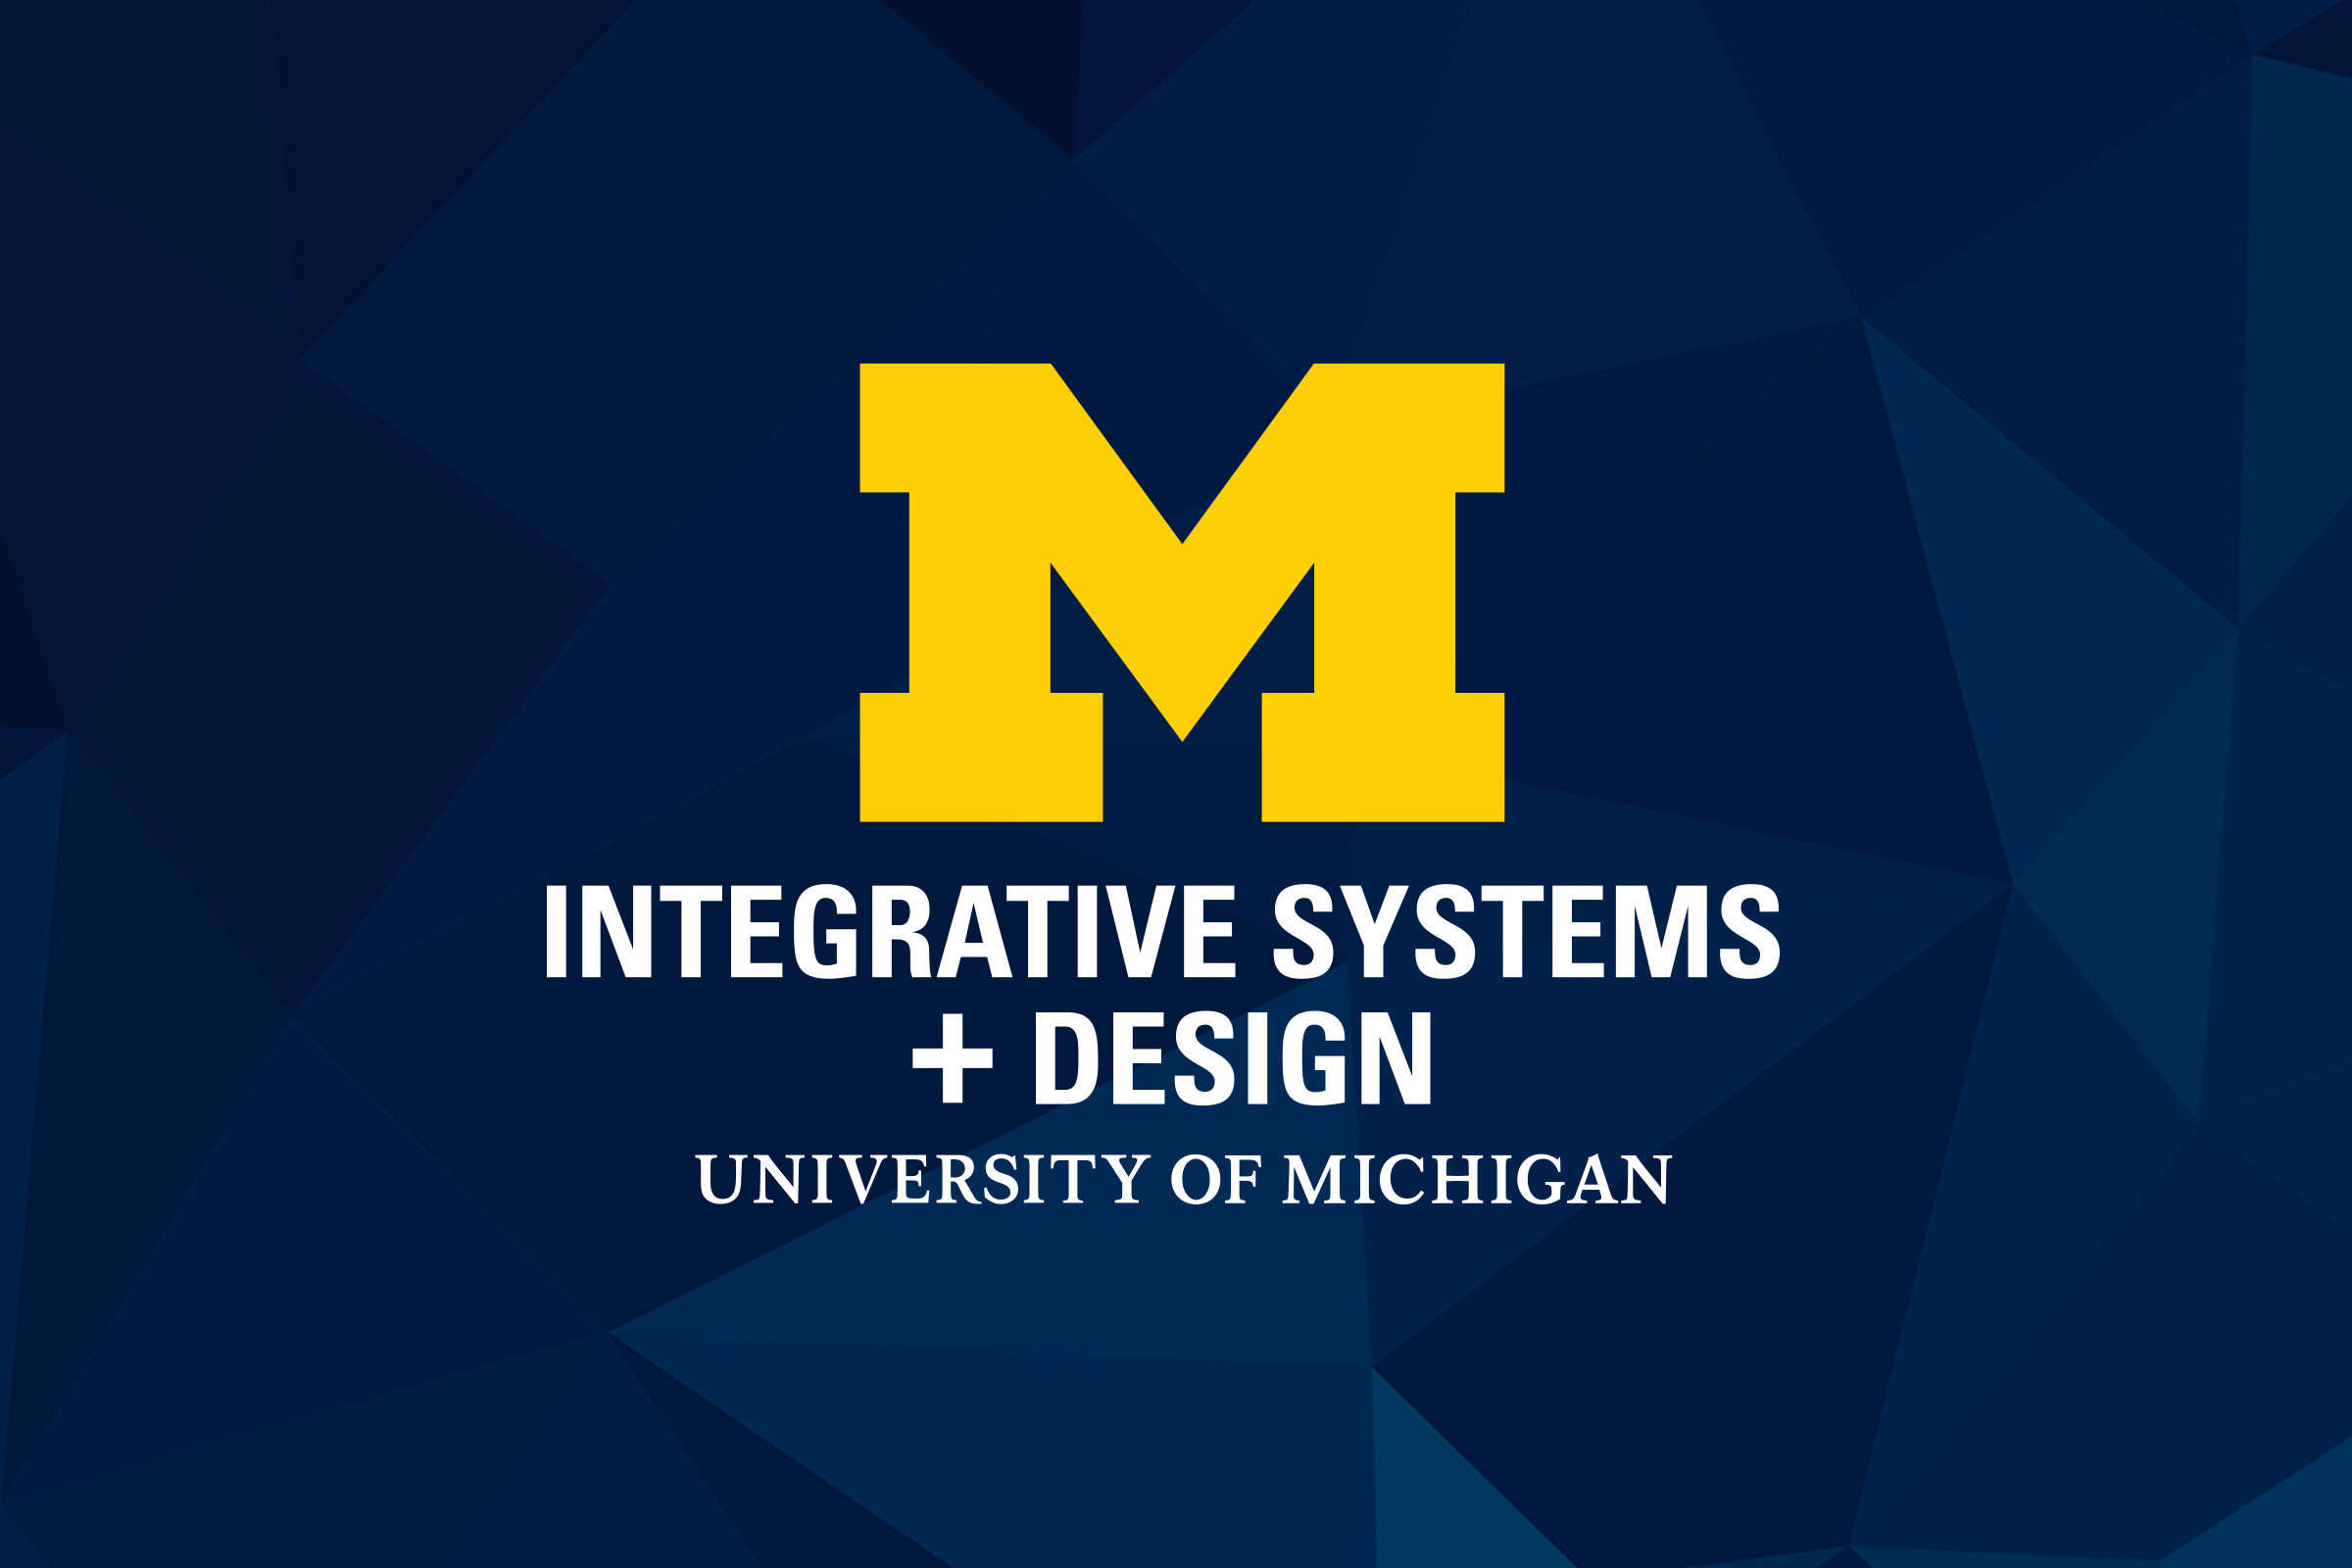 Integrative Systems + Design logo